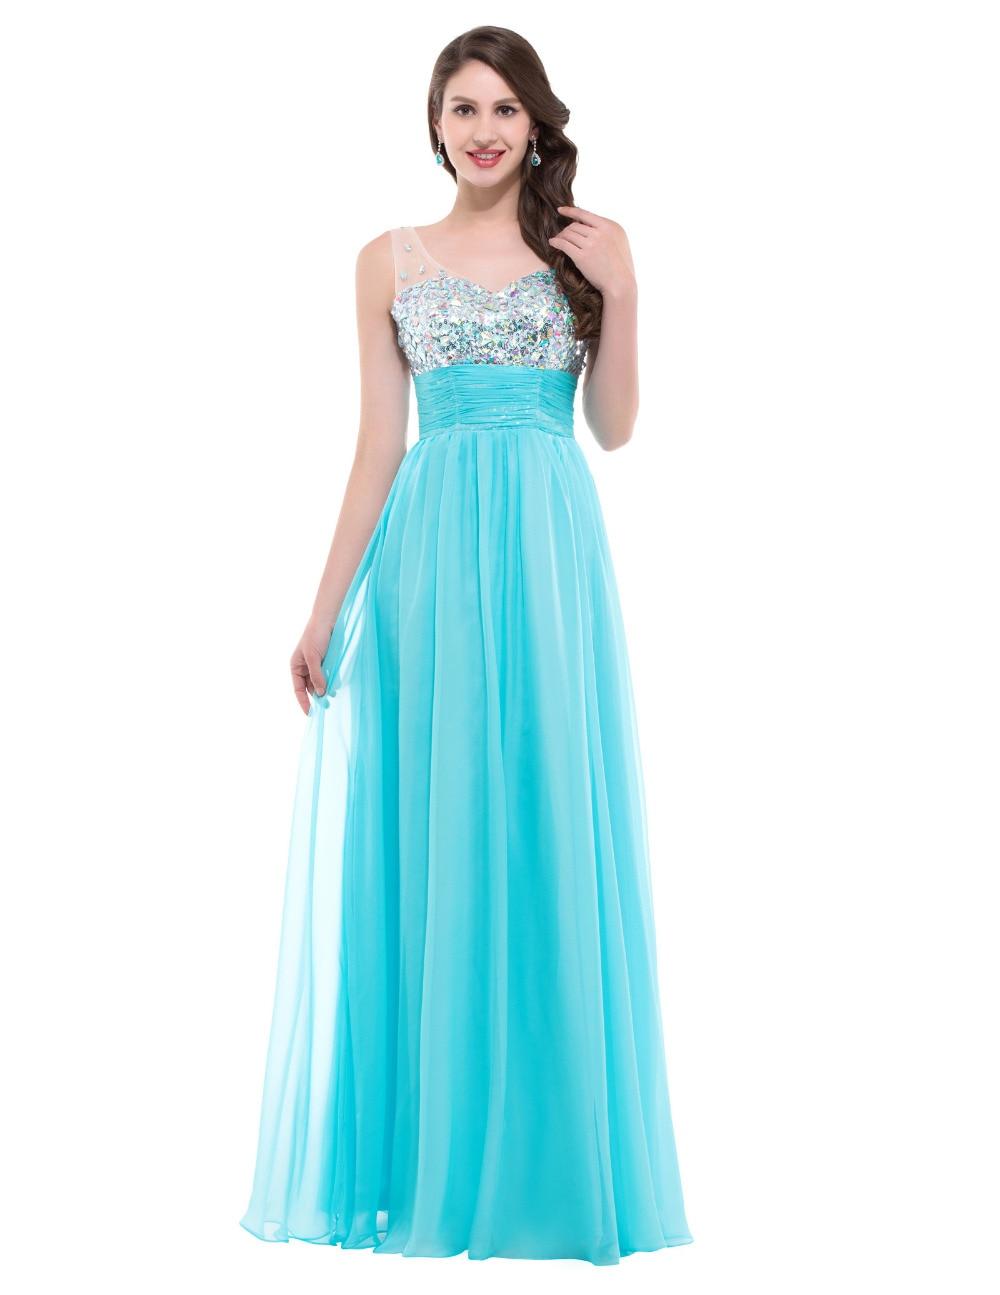 sky blue long prom dresses_Prom Dresses_dressesss